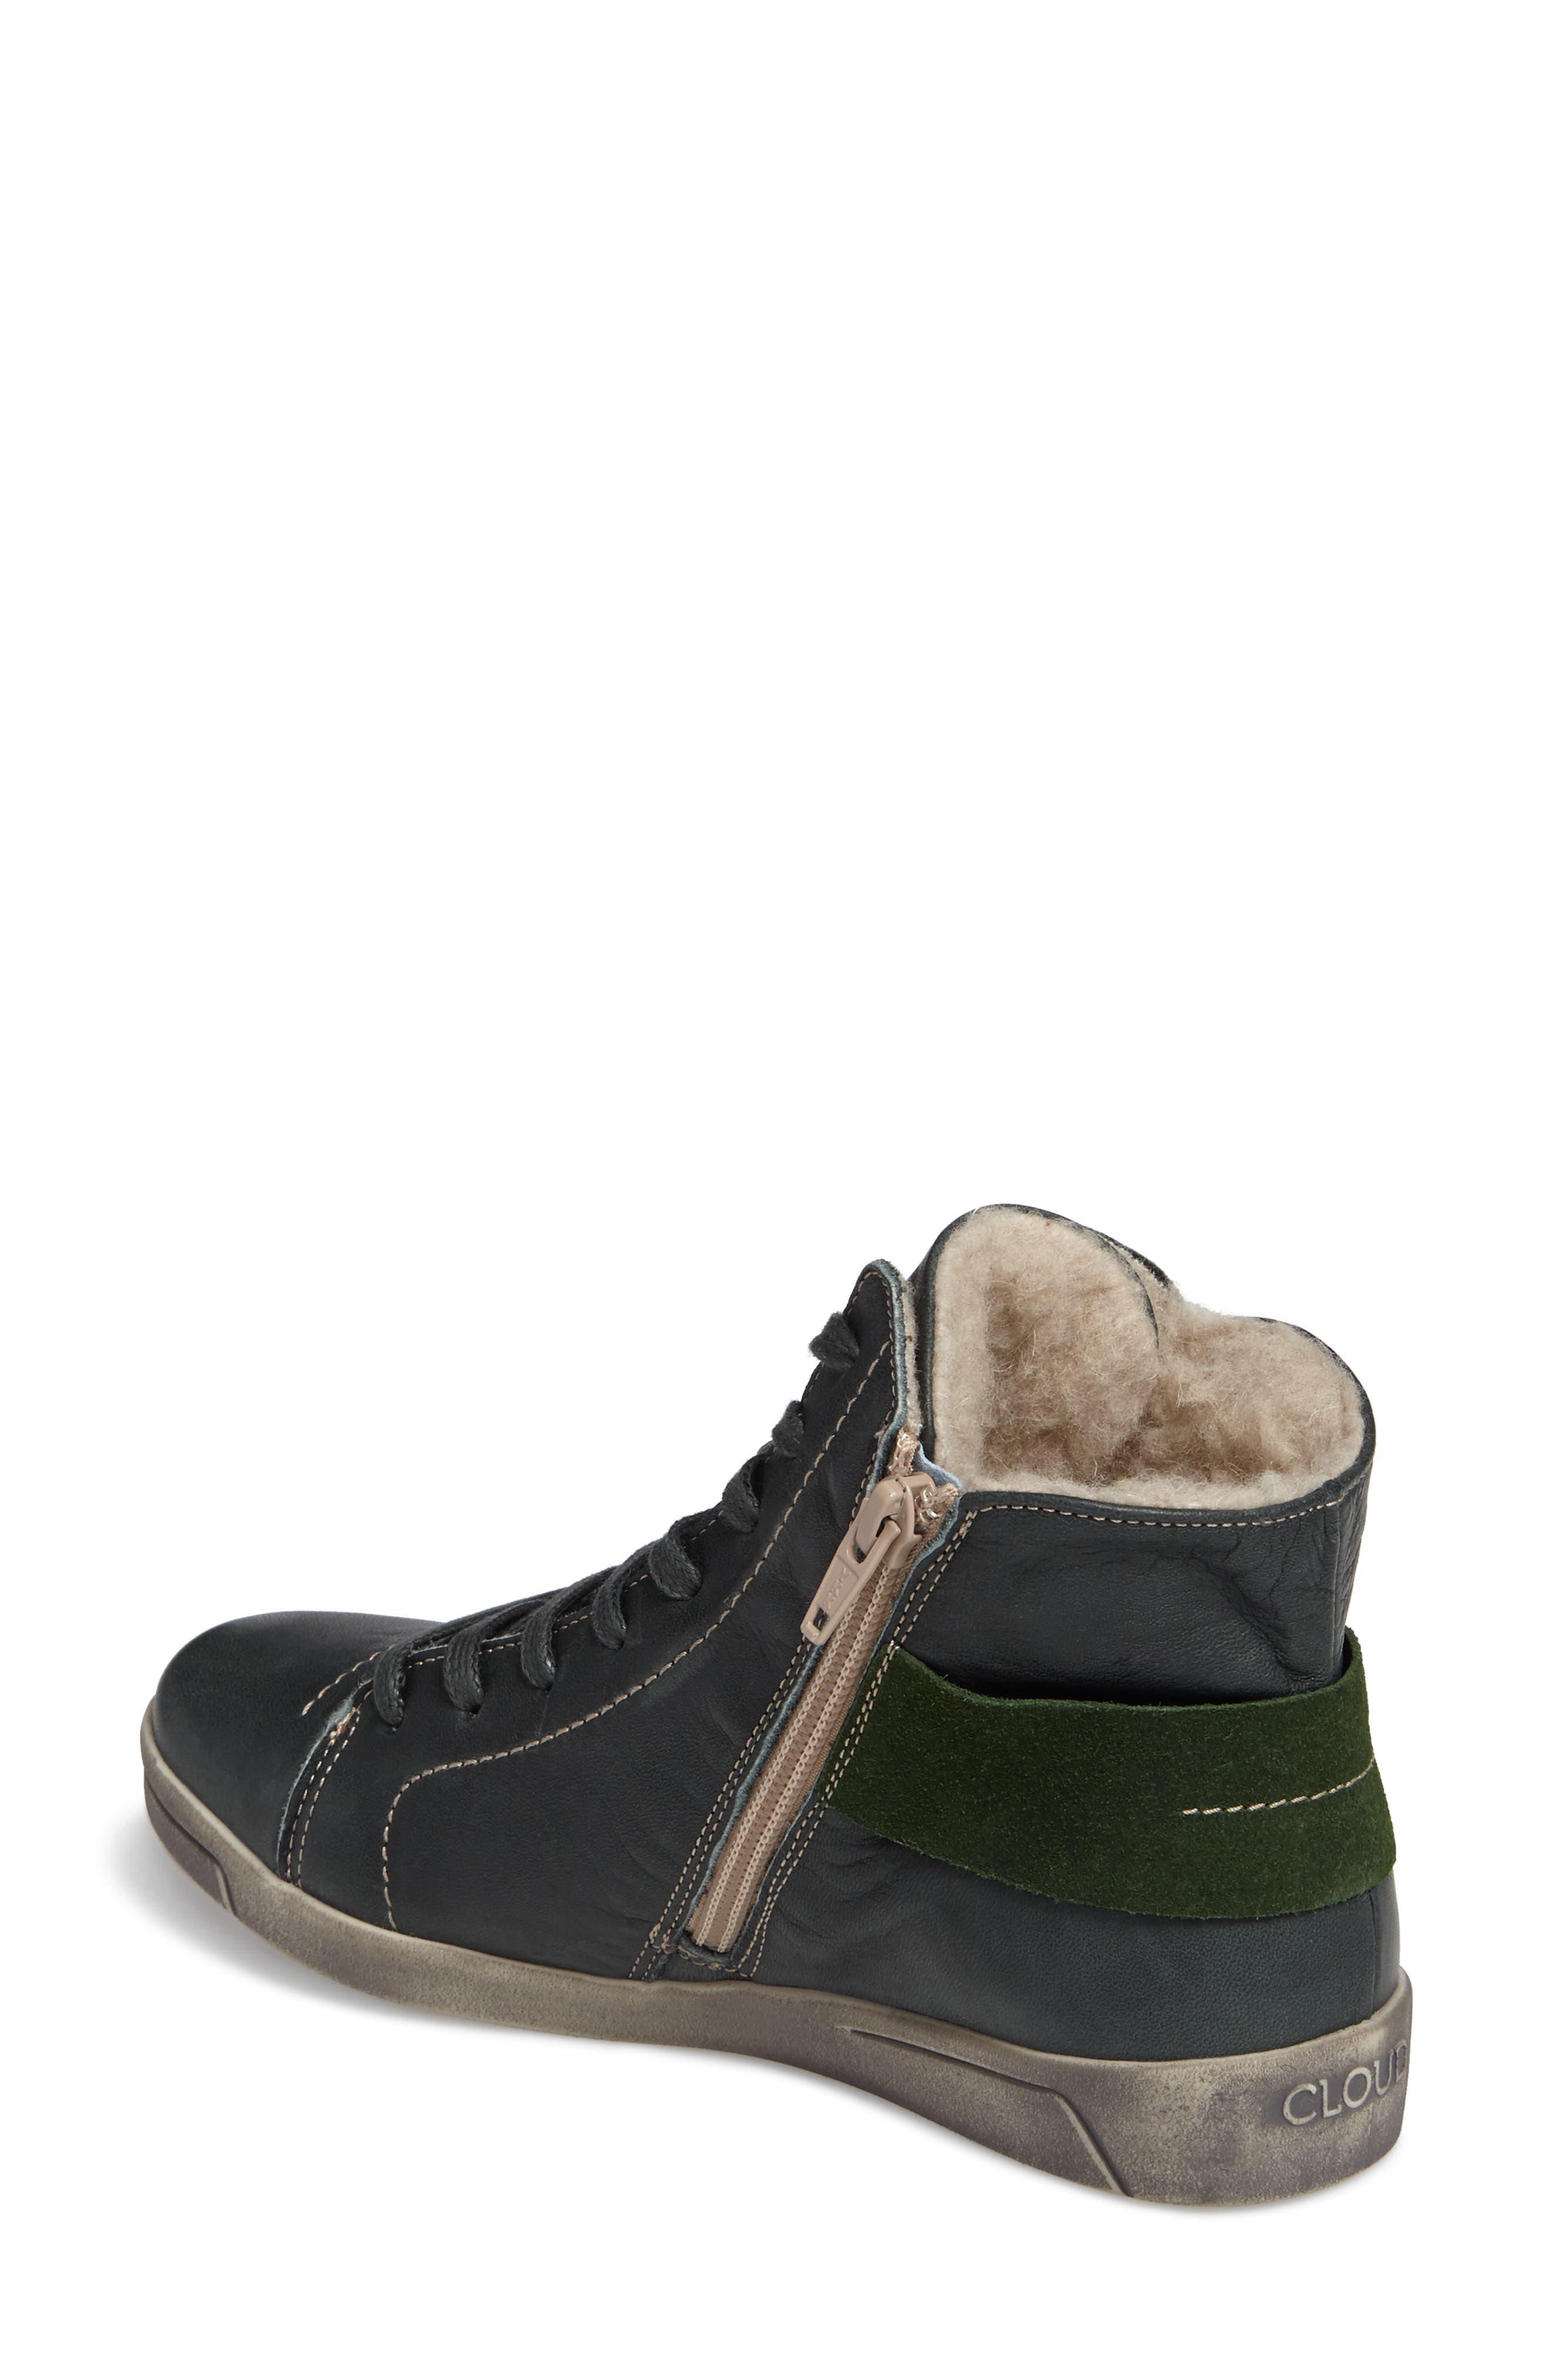 Alternate Image 2  - CLOUD 'Aline' Sneaker (Women)